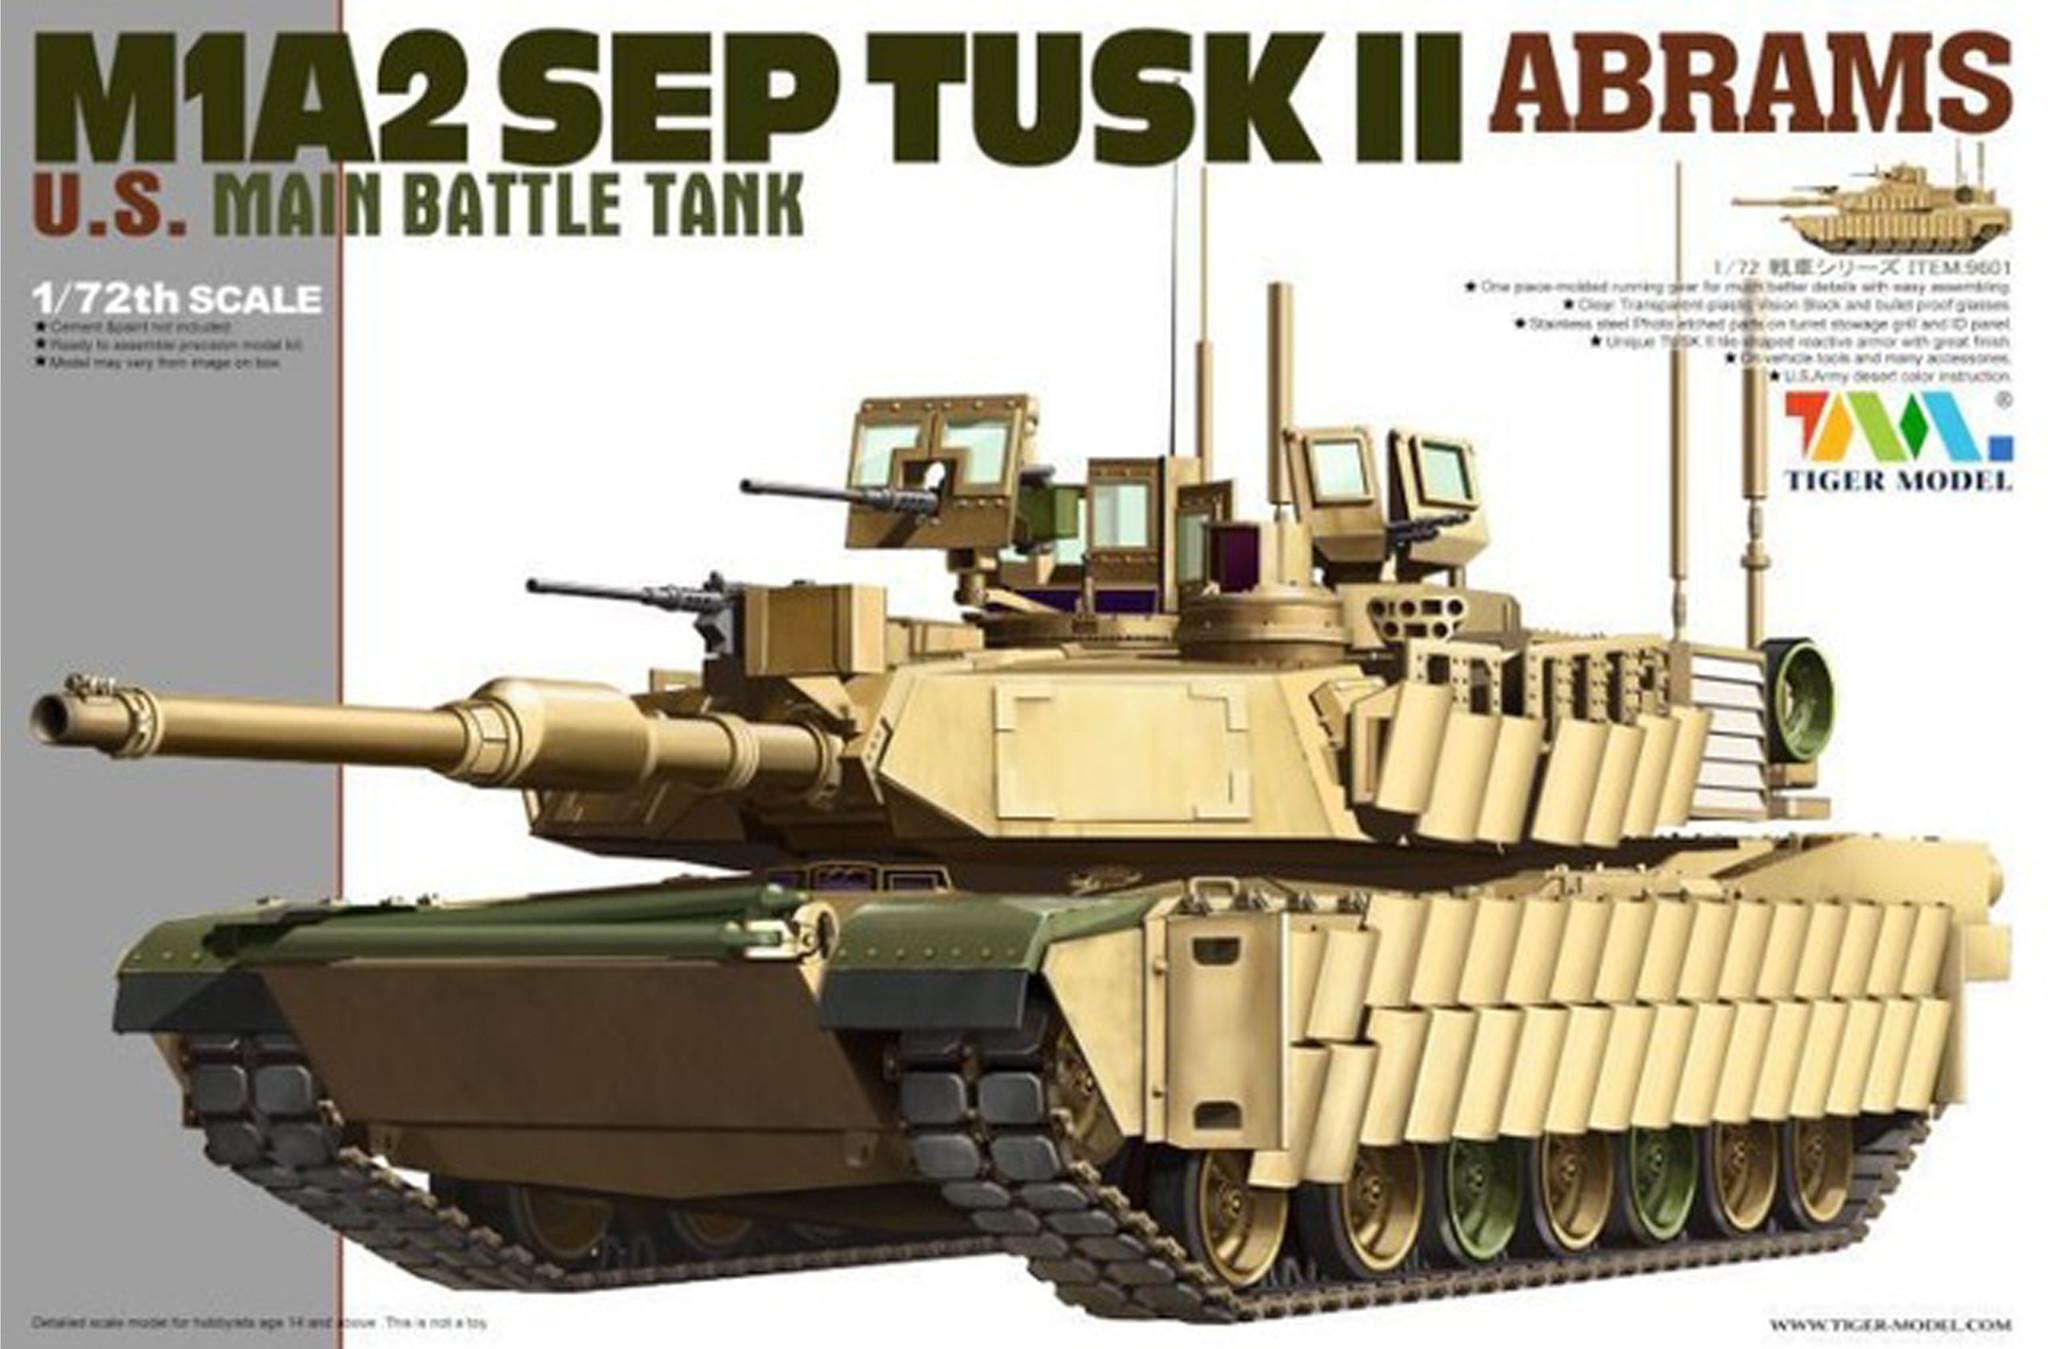 Tiger Model M1A2 Tusk II Abrams - Tiger Model - Scale 1/72 - TIGE9601